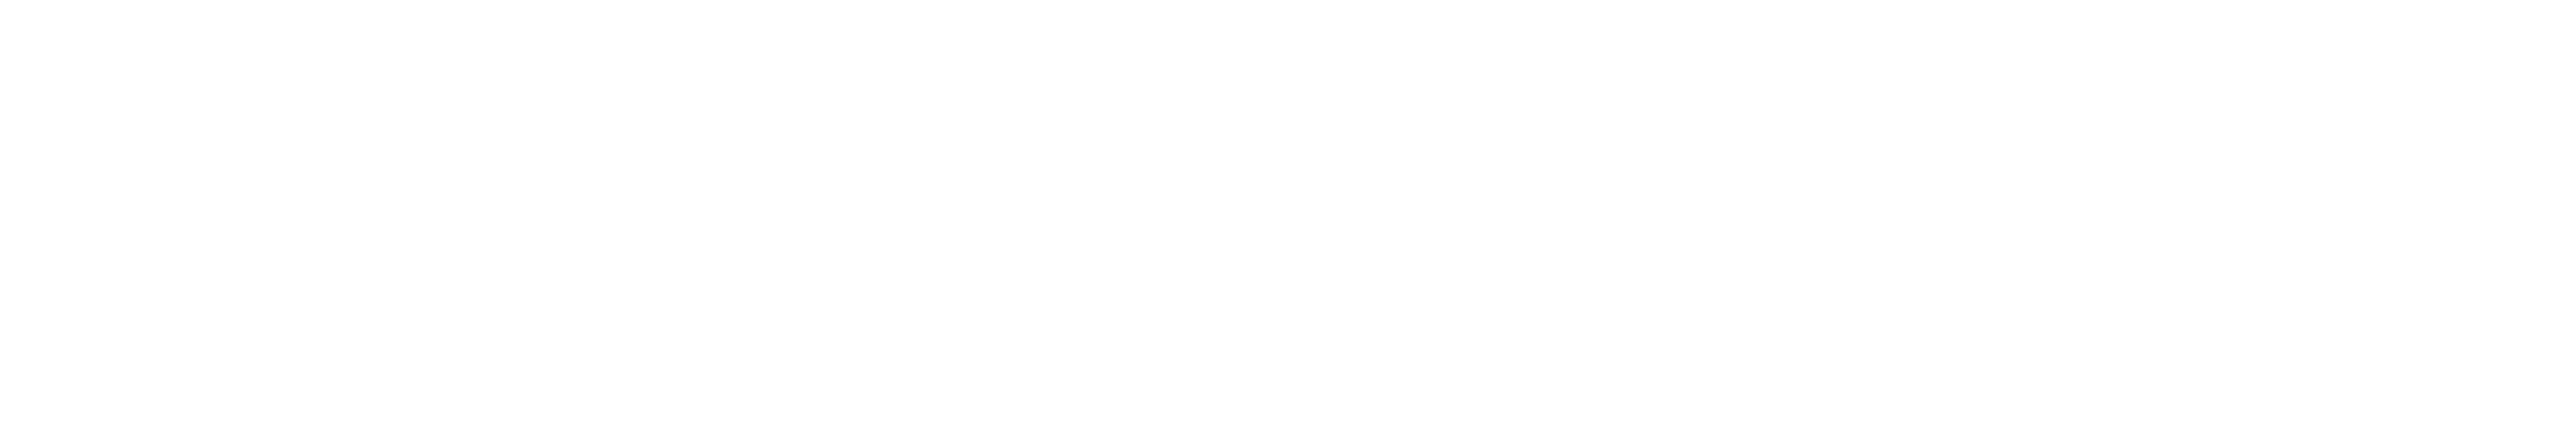 mogayaltd logo